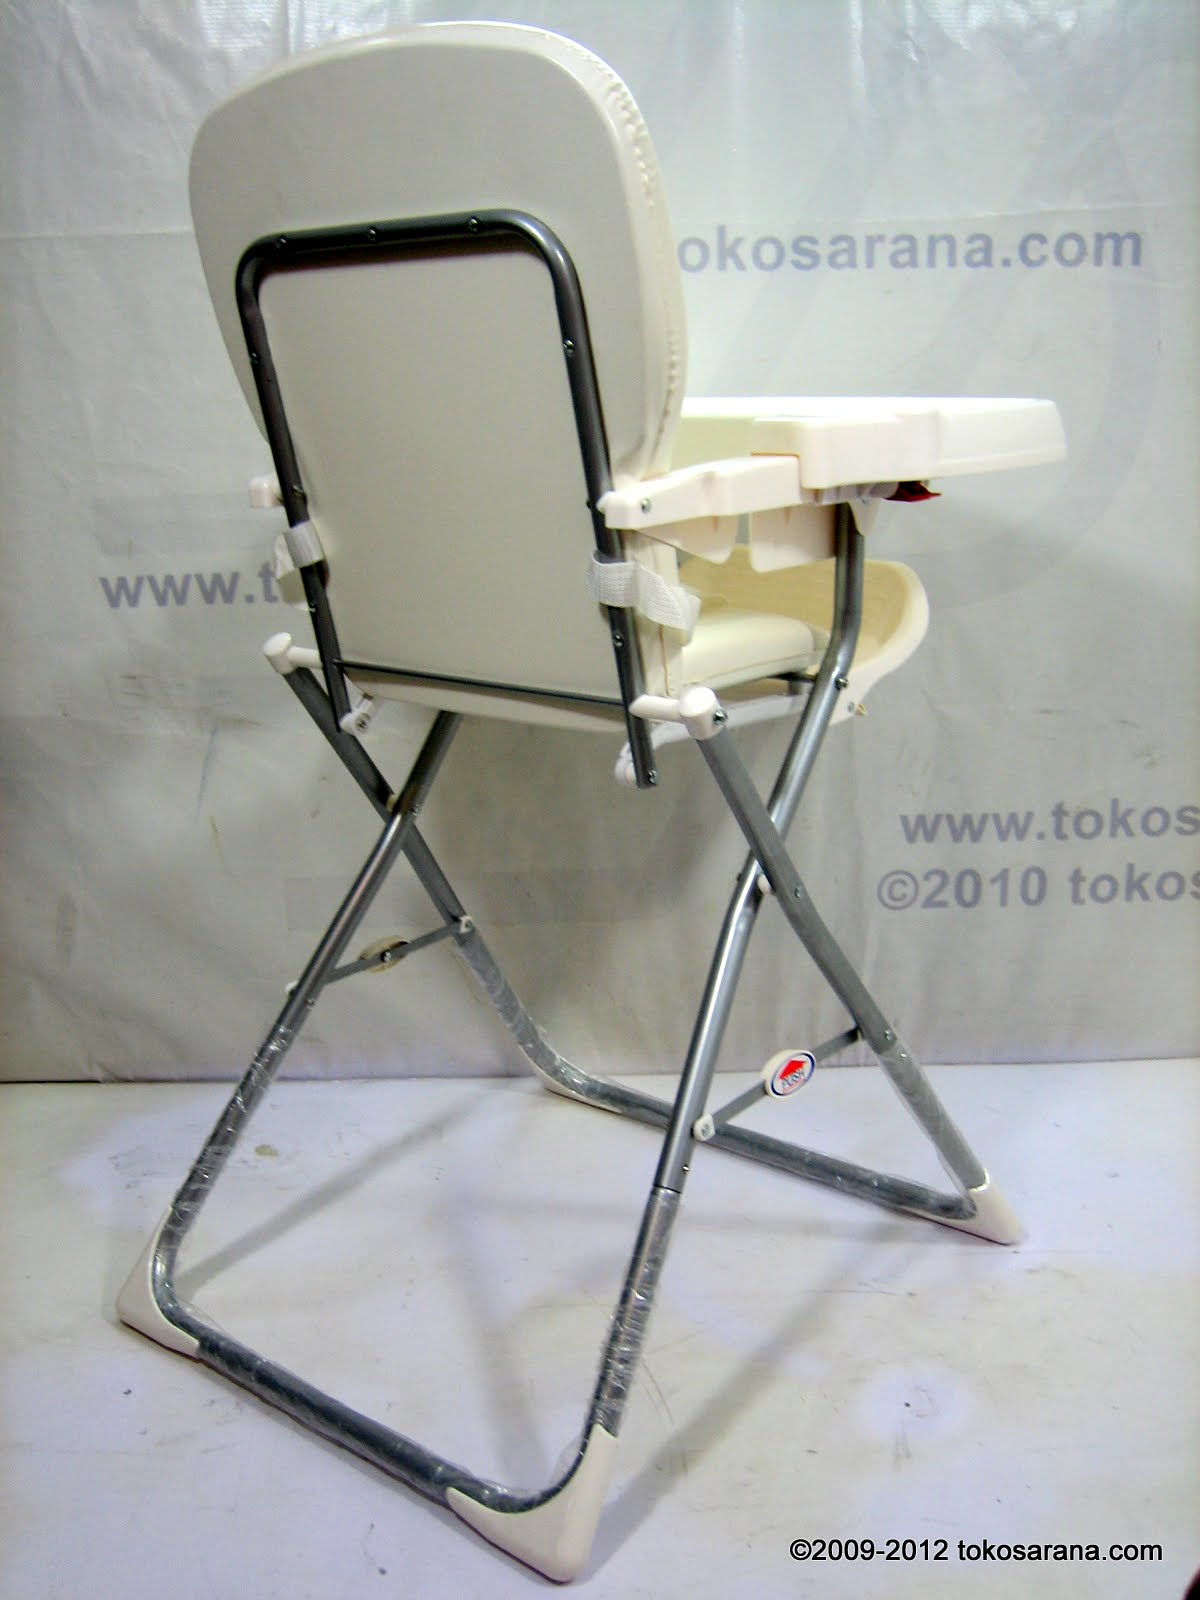 High Chair That Folds Flat Turkey Hunting Clearance Sale Sepeda Mainan Anak Dan Perlengkapan Bayi